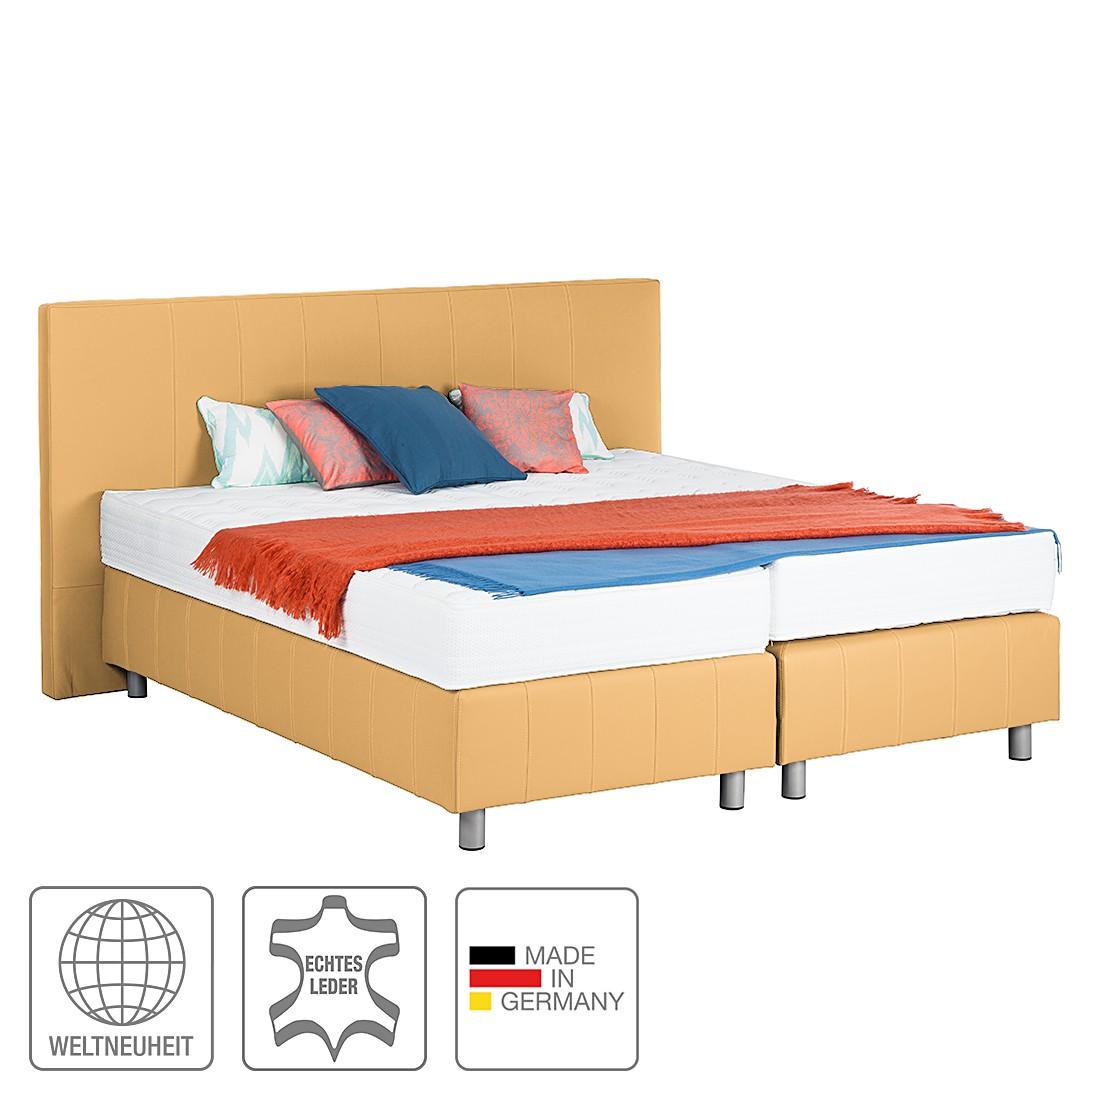 Boxspringbett Atlanta (Echtleder) - Ohne Topper - 140 x 200cm - H3 ab 80 kg - Gelb, Art of Sleep